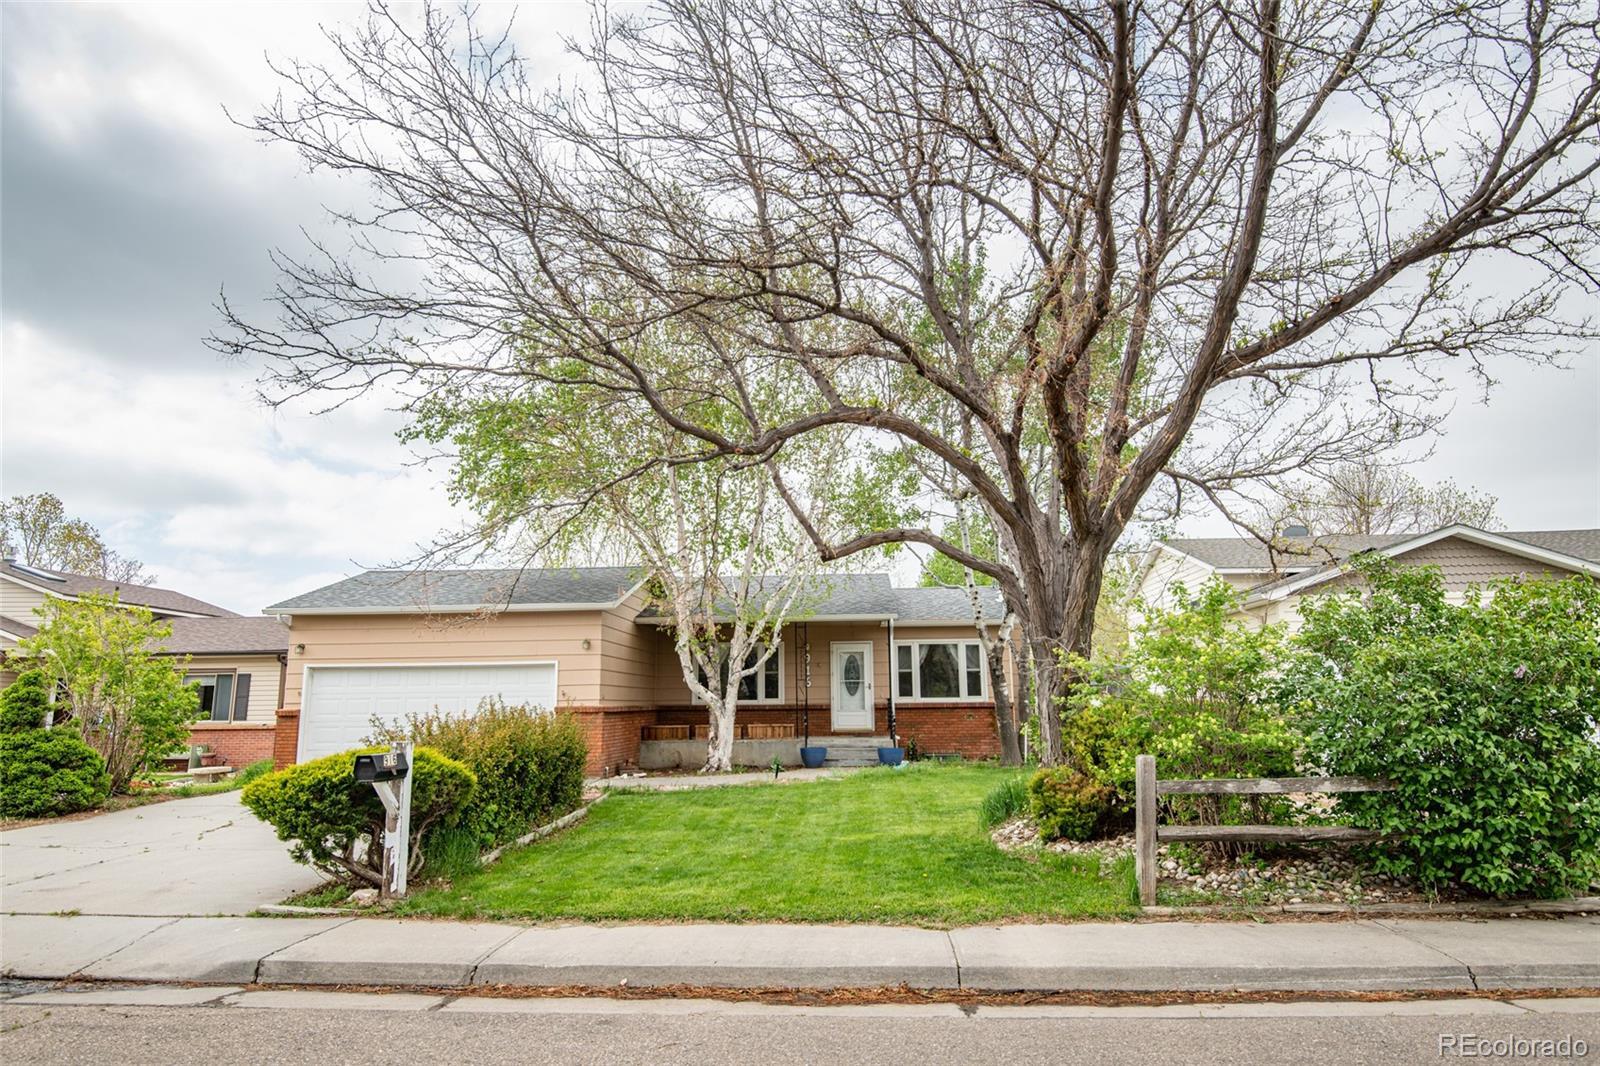 916 Ram Road, Fort Morgan, CO 80701 - Fort Morgan, CO real estate listing